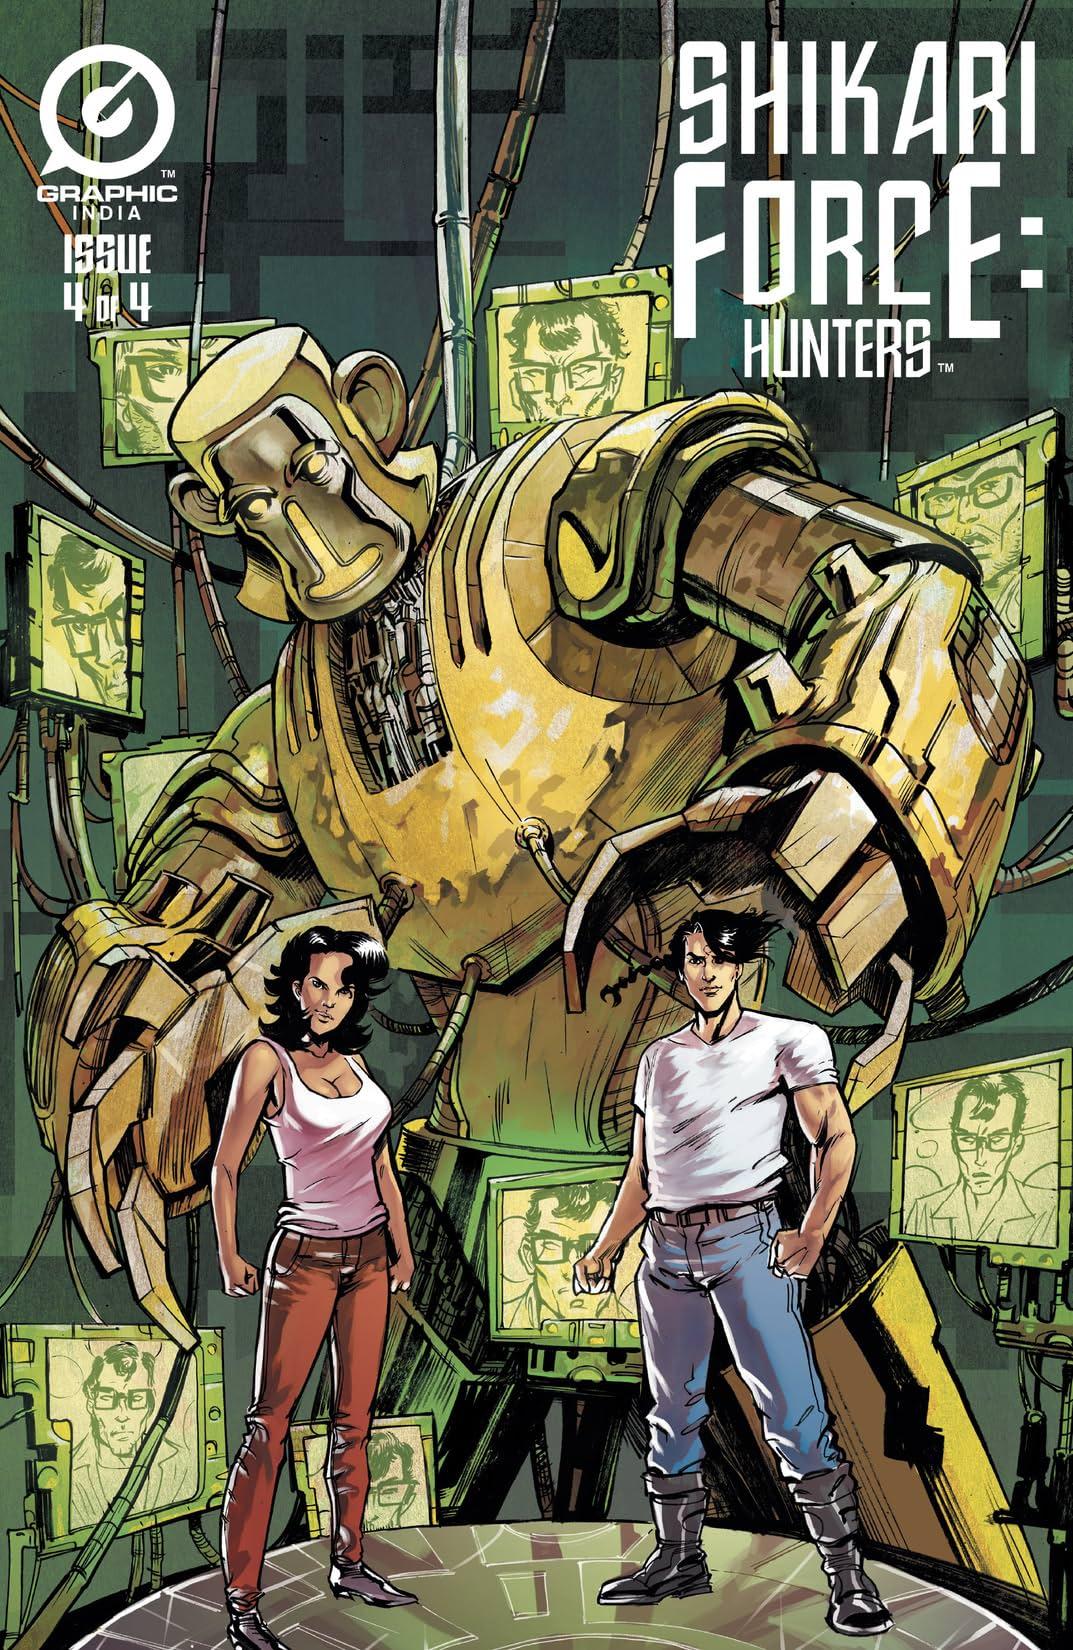 Shikari Force: Hunters #4 (of 4)